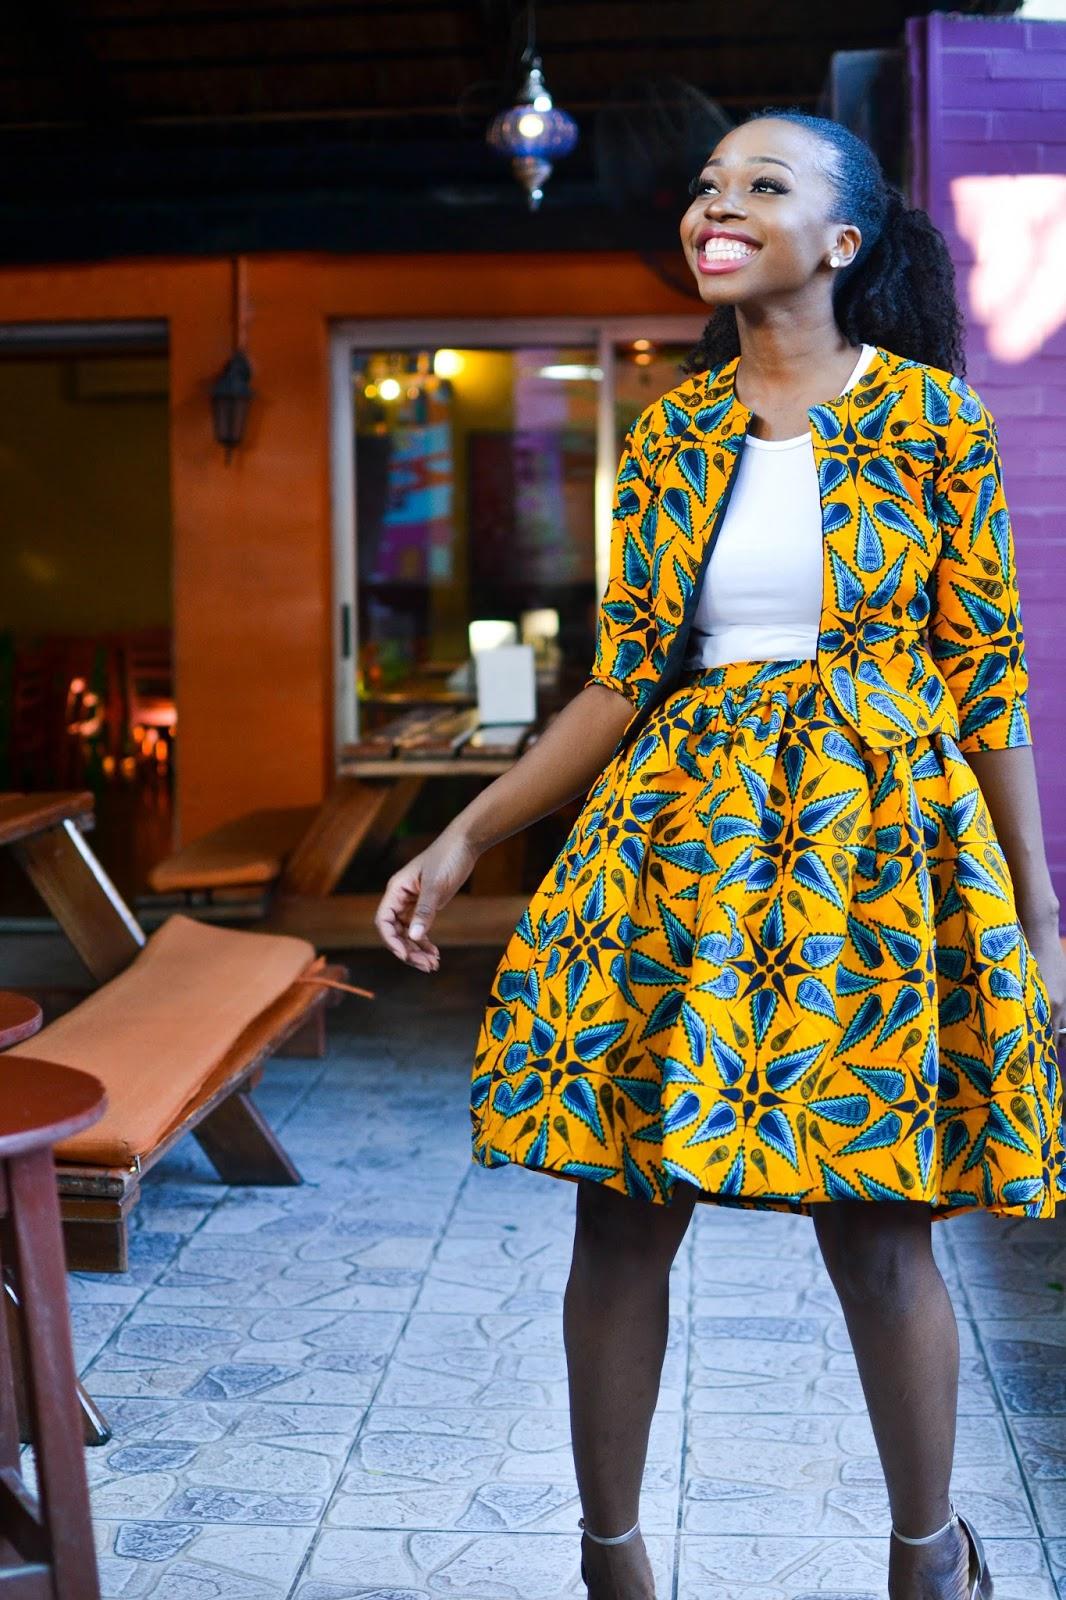 Vibrant Prints on a Nigerian Fashion Blogger